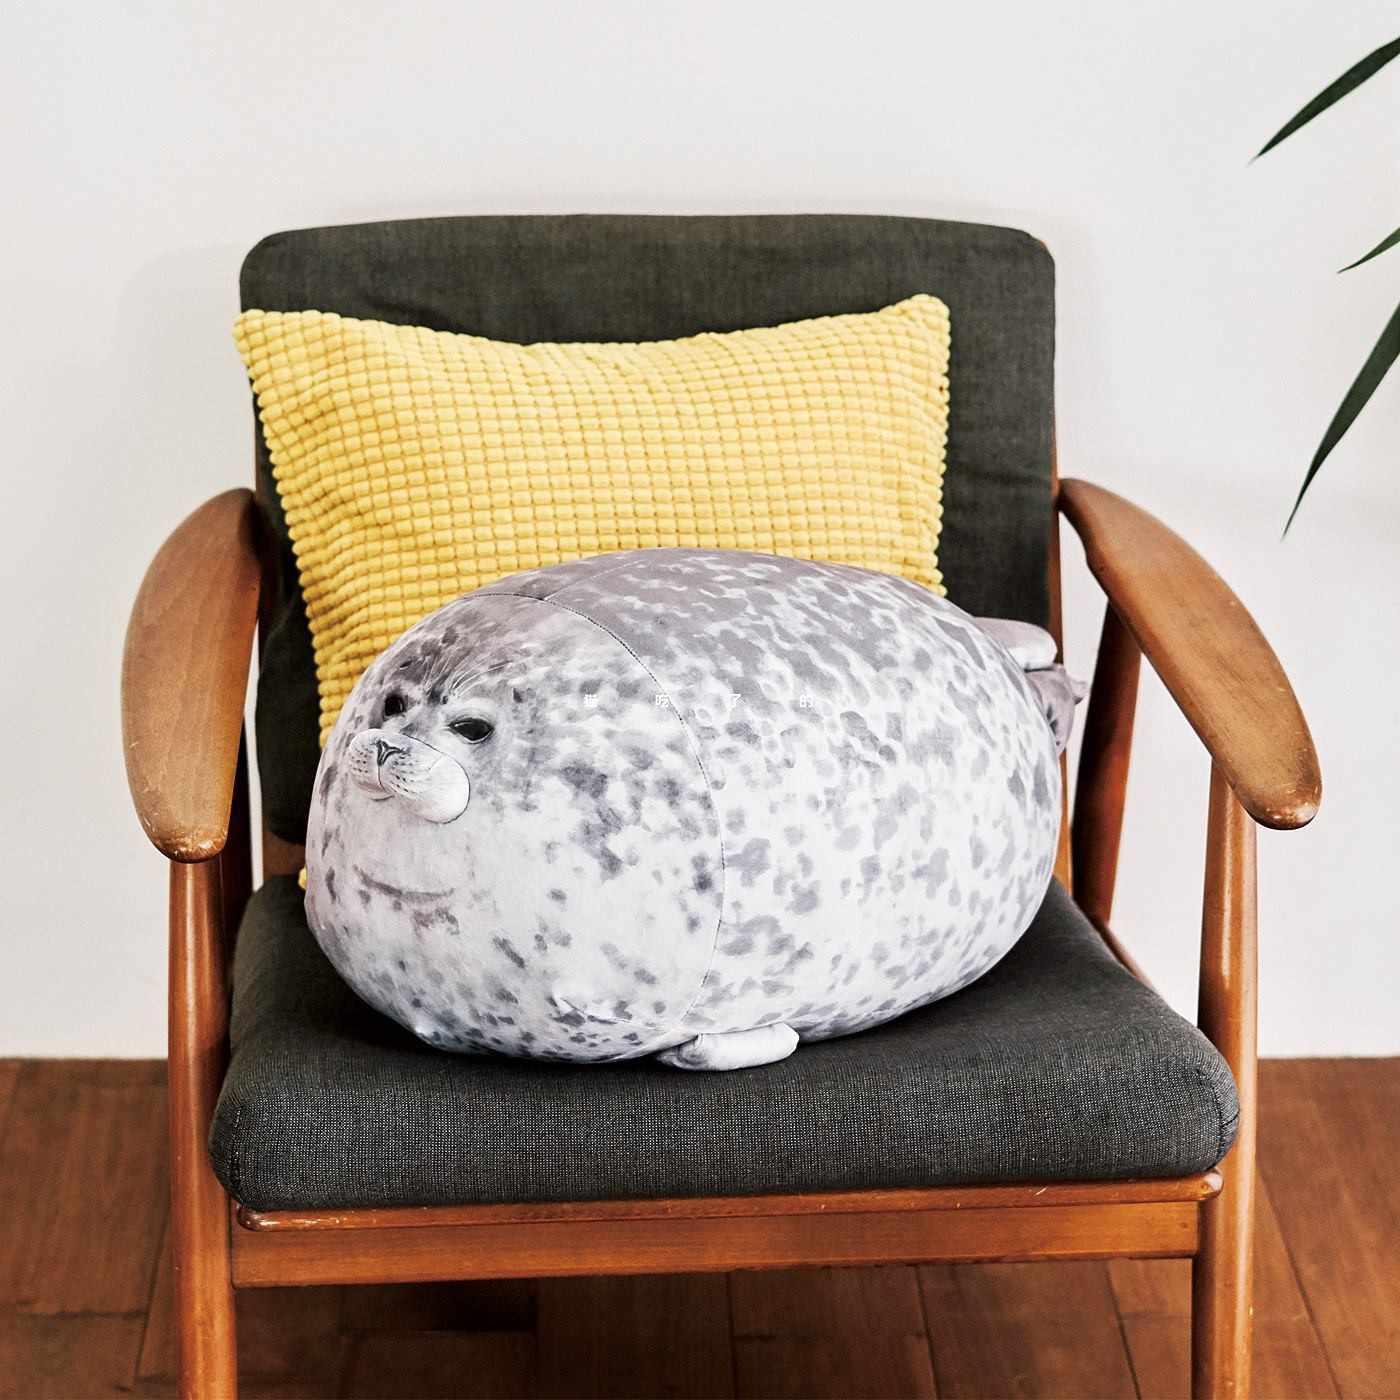 3d novidade lance travesseiros macio selo travesseiro pelúcia recheado de pelúcia housewarming festa hold travesseiro n2050